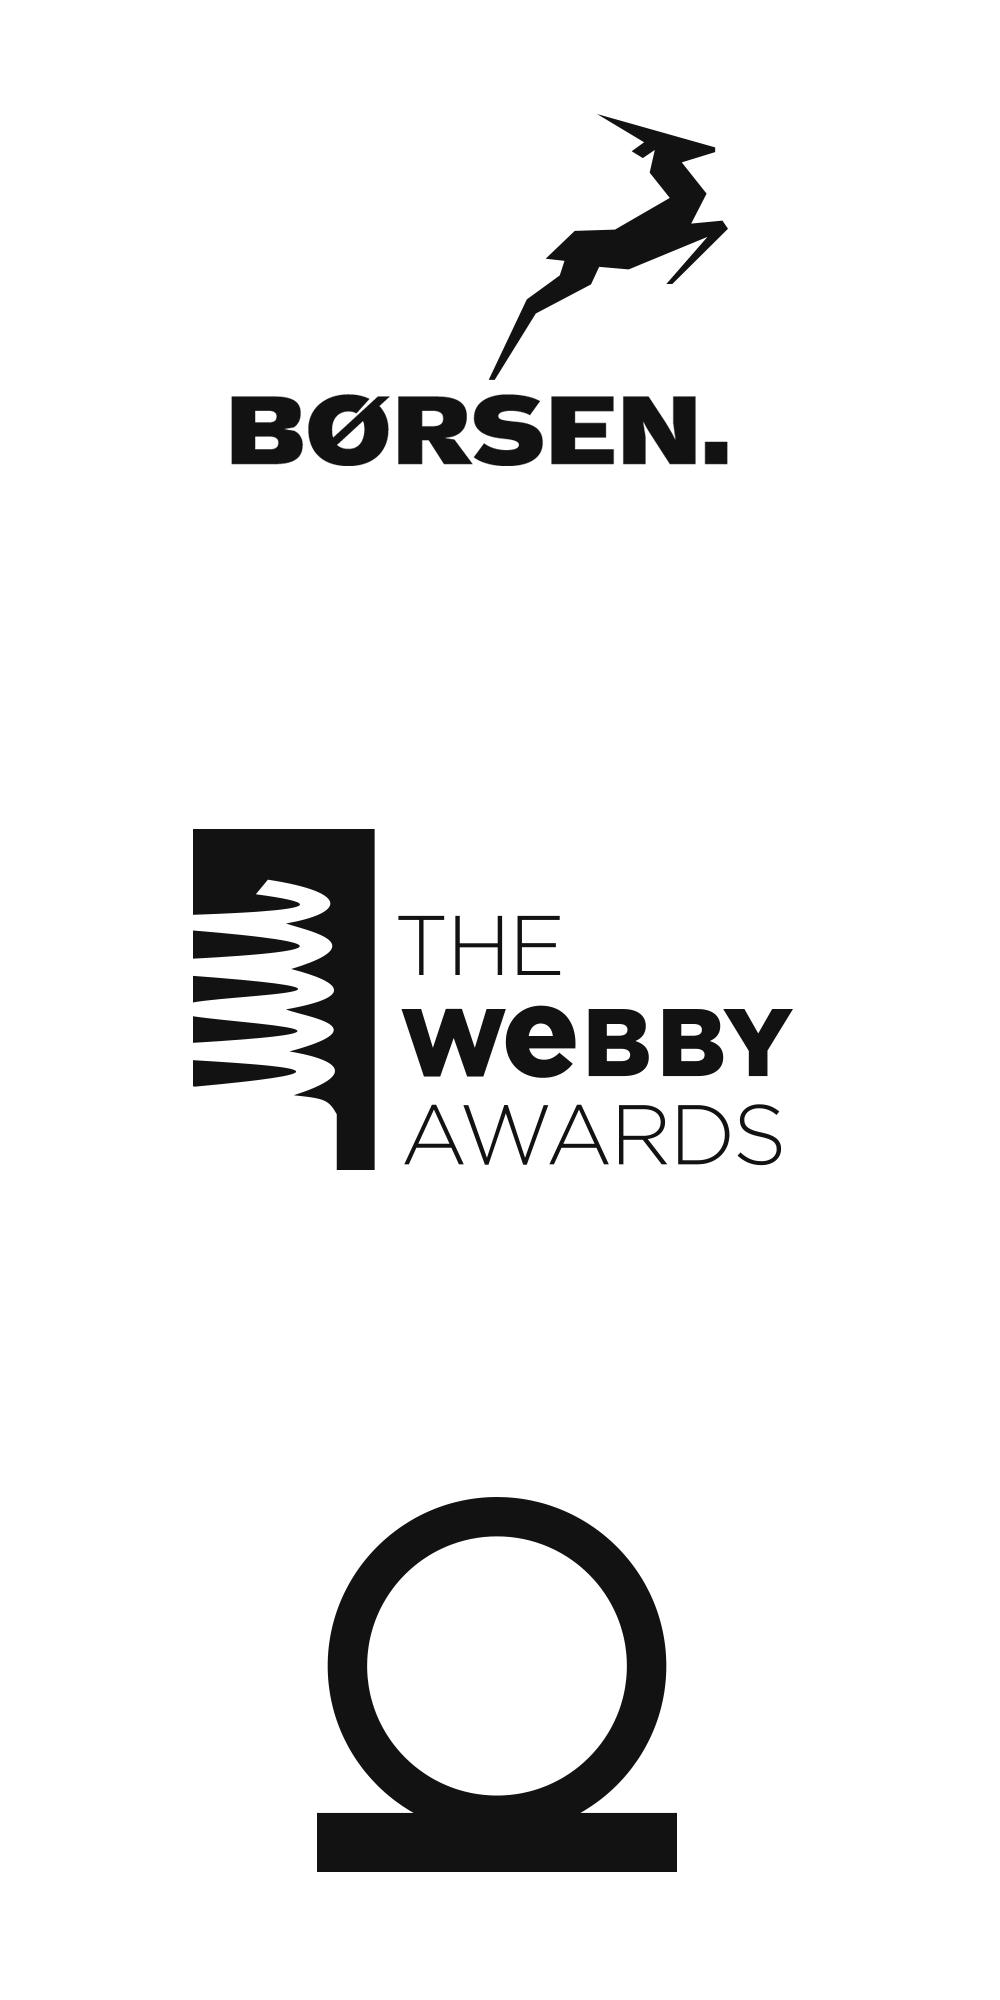 awards_1.png